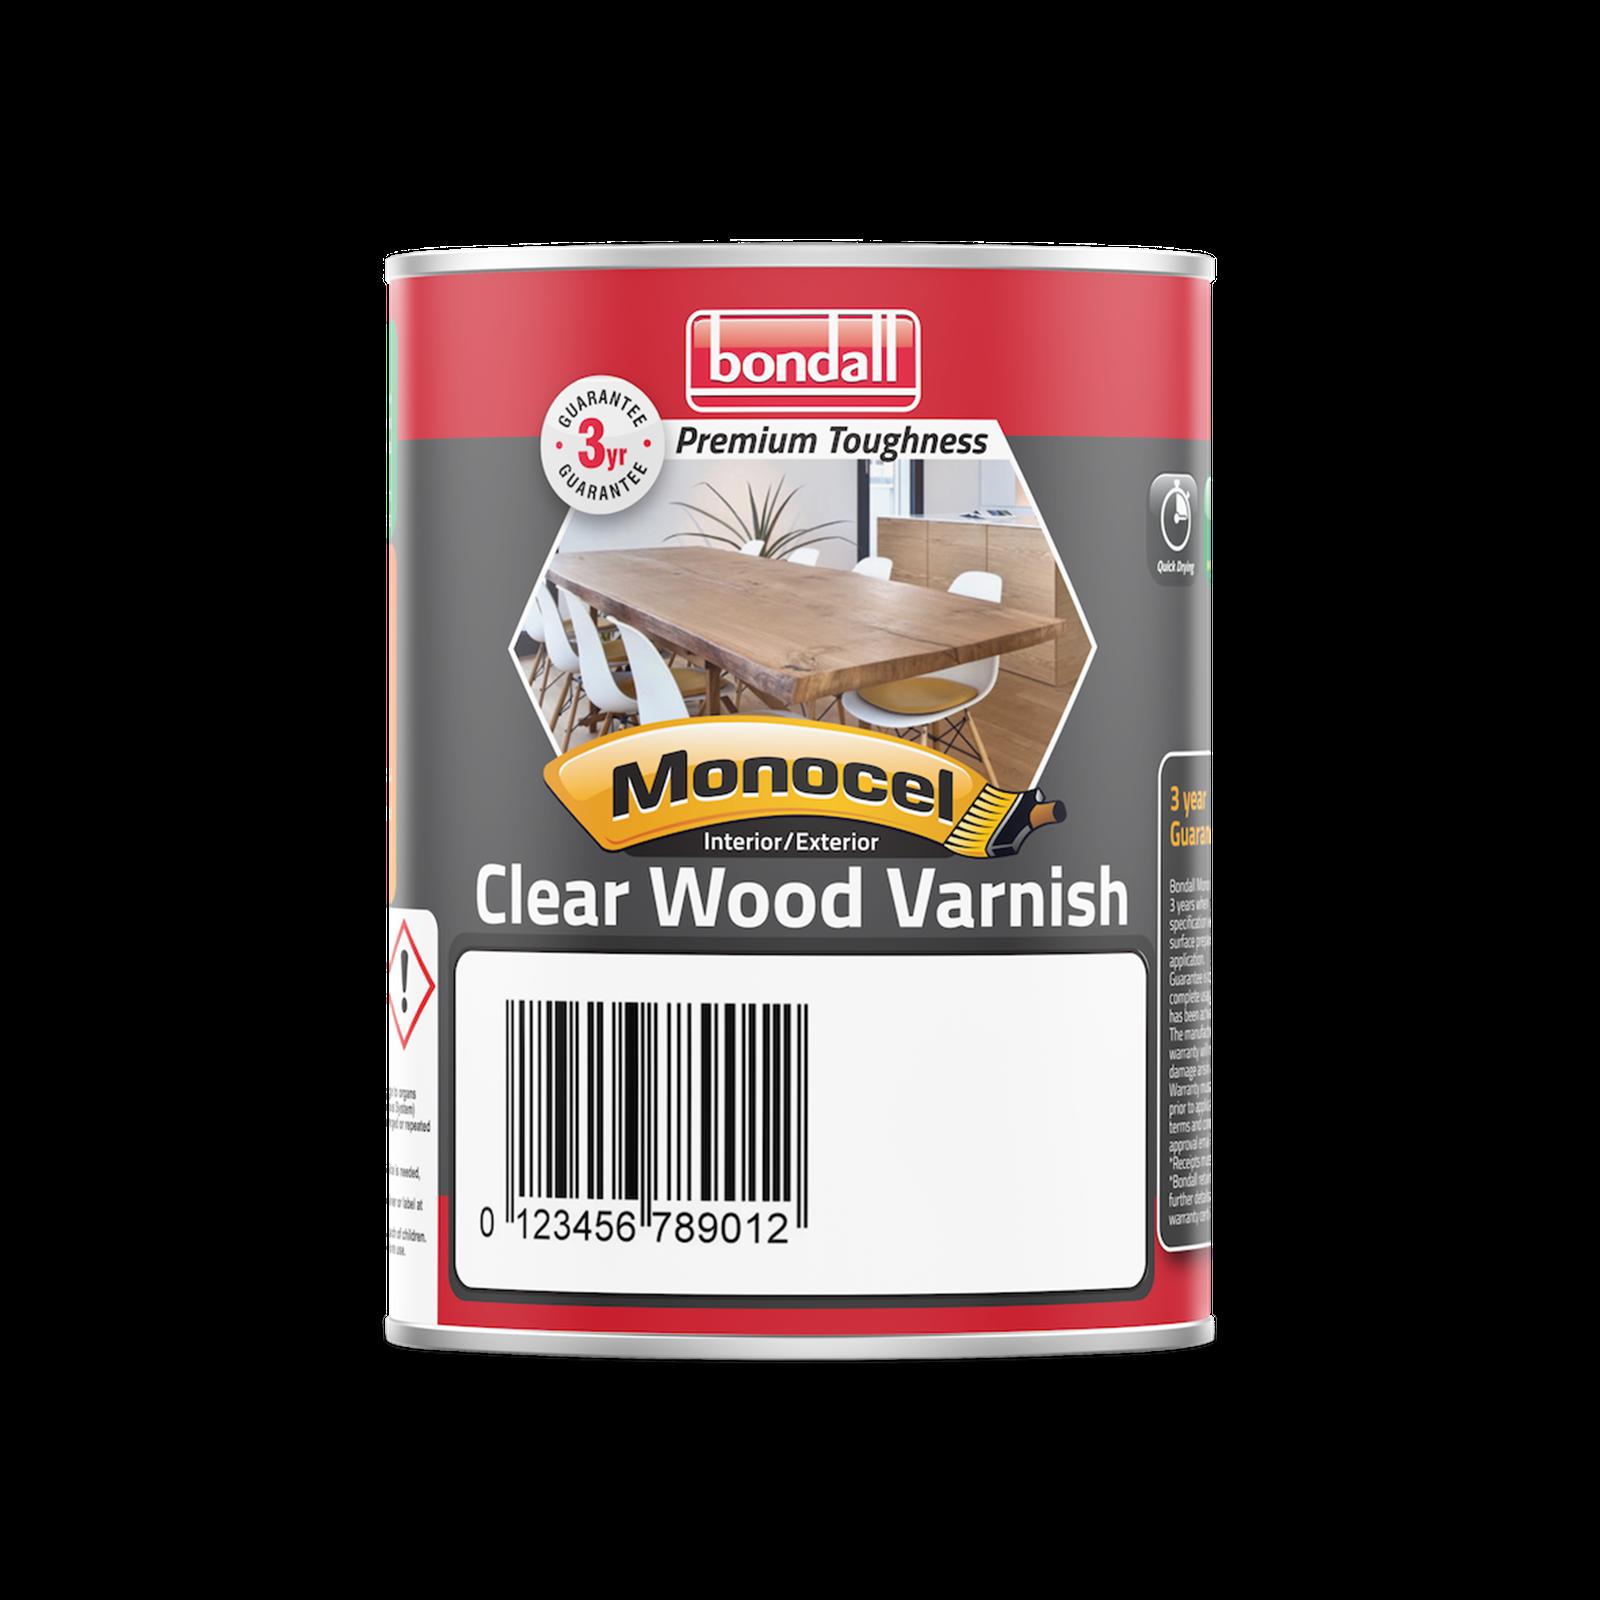 Bondall 250ml Satin Monocel Clear Timber Varnish